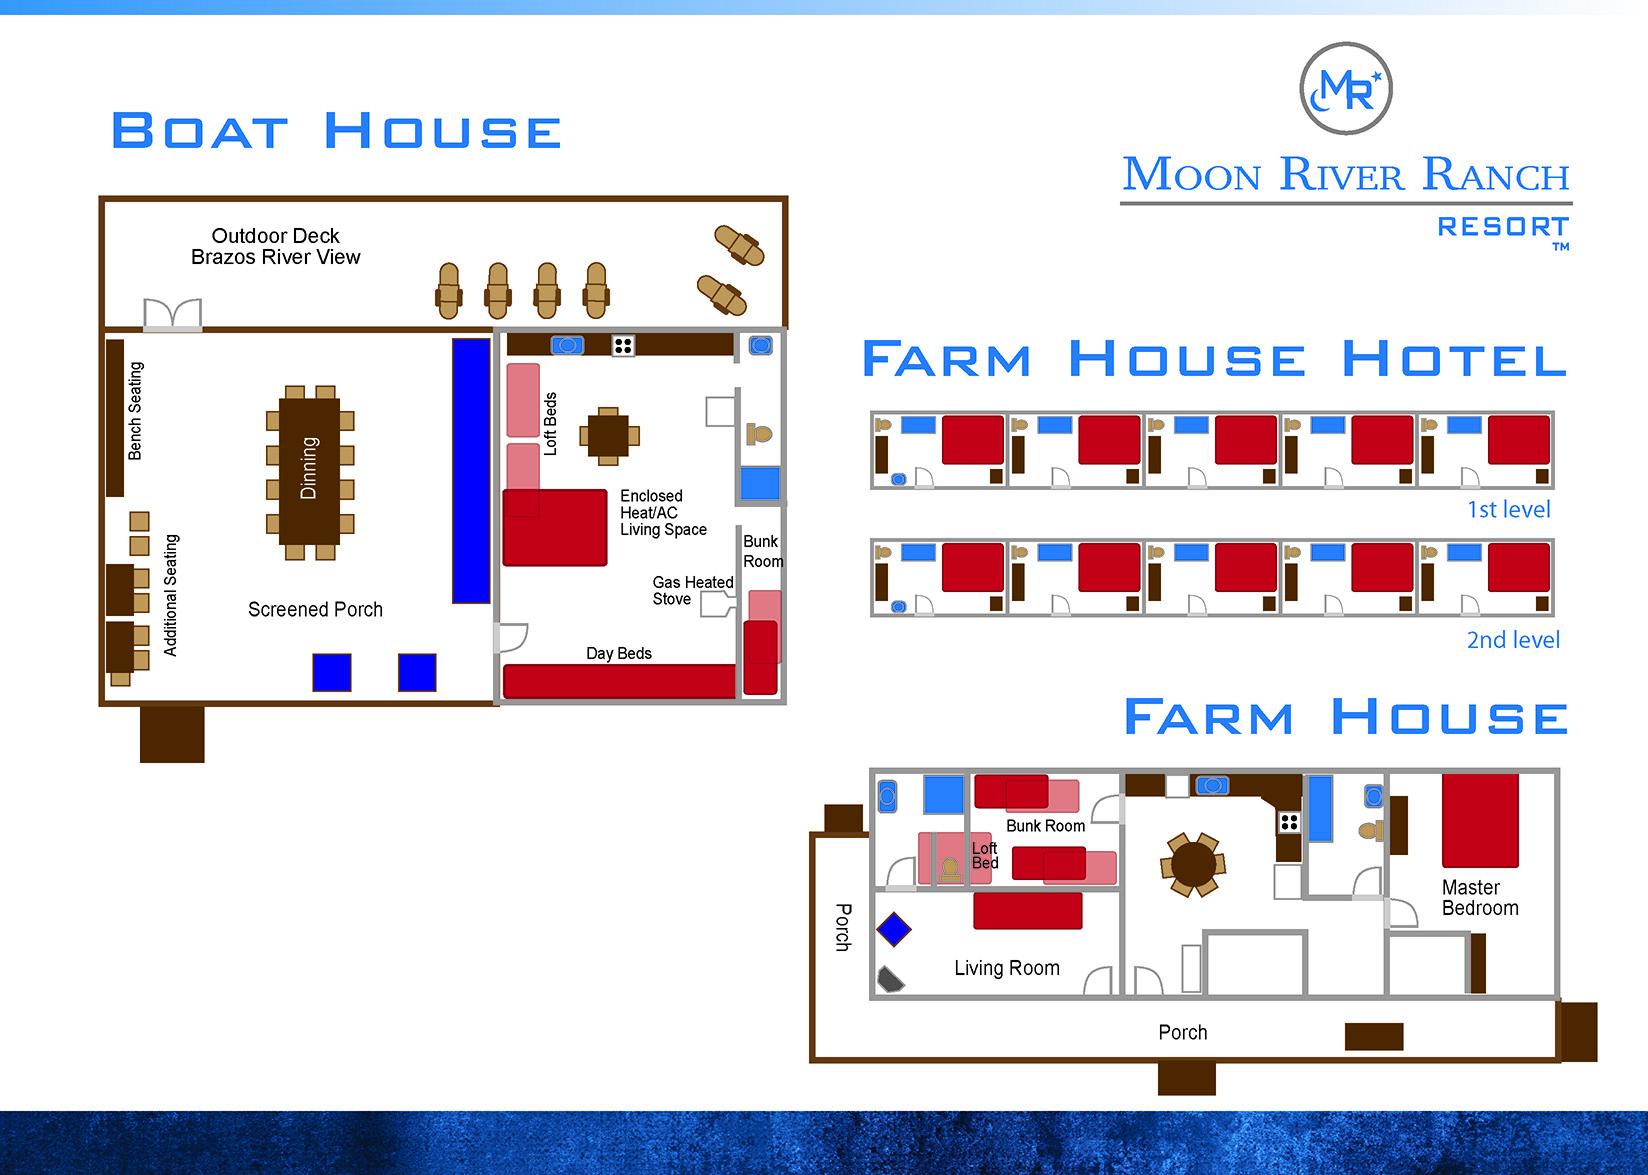 boat house farm house and hotel floor plans